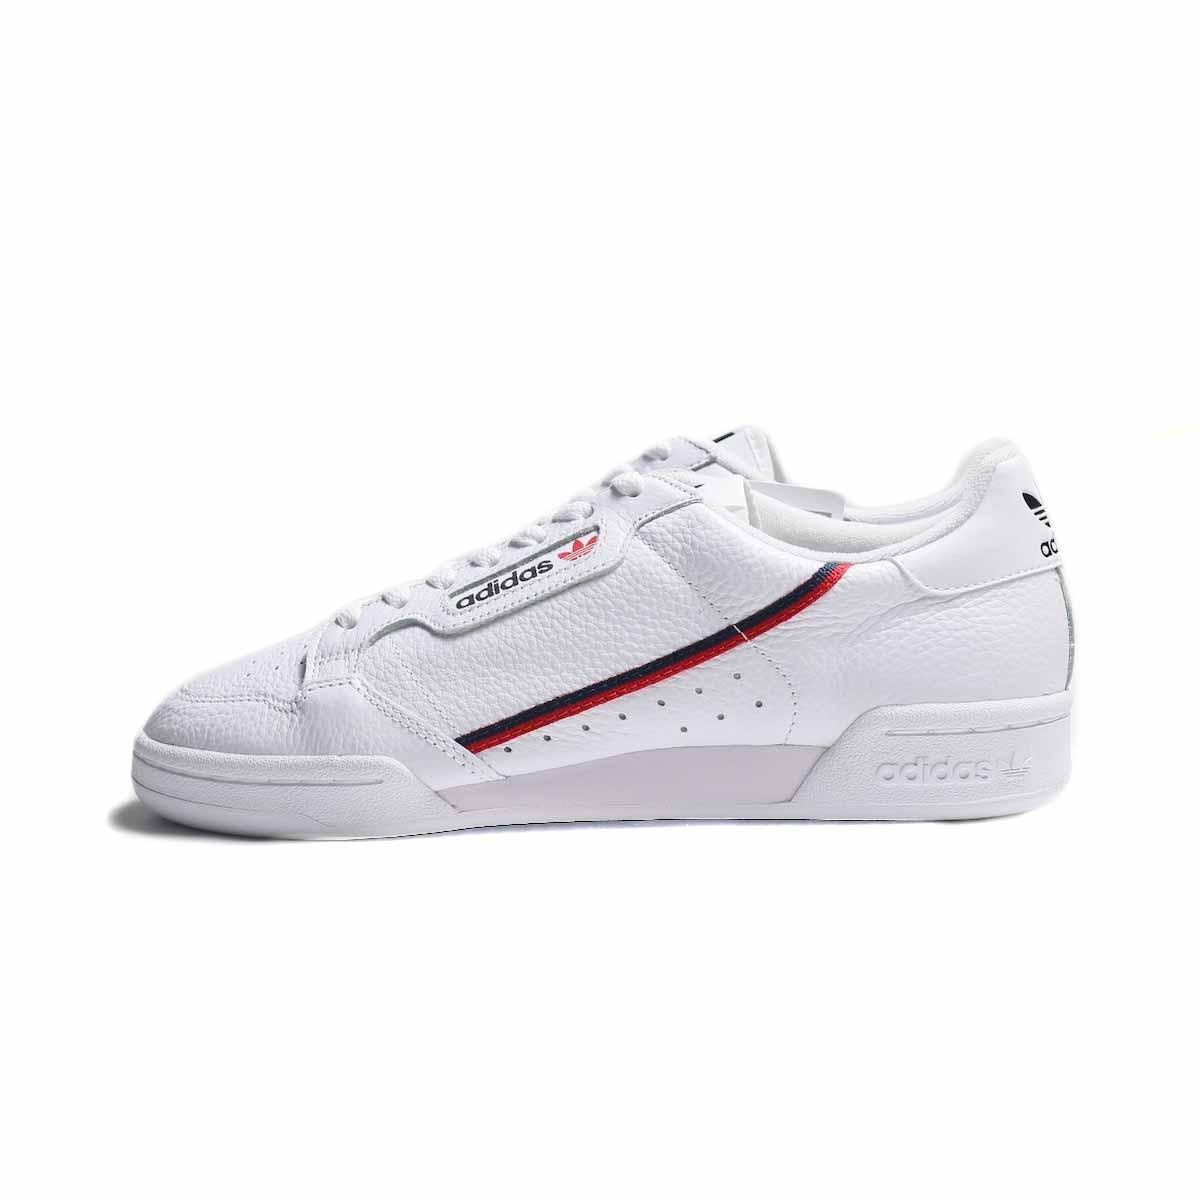 adidas originals / CONTINENTAL80 (G27706) -White